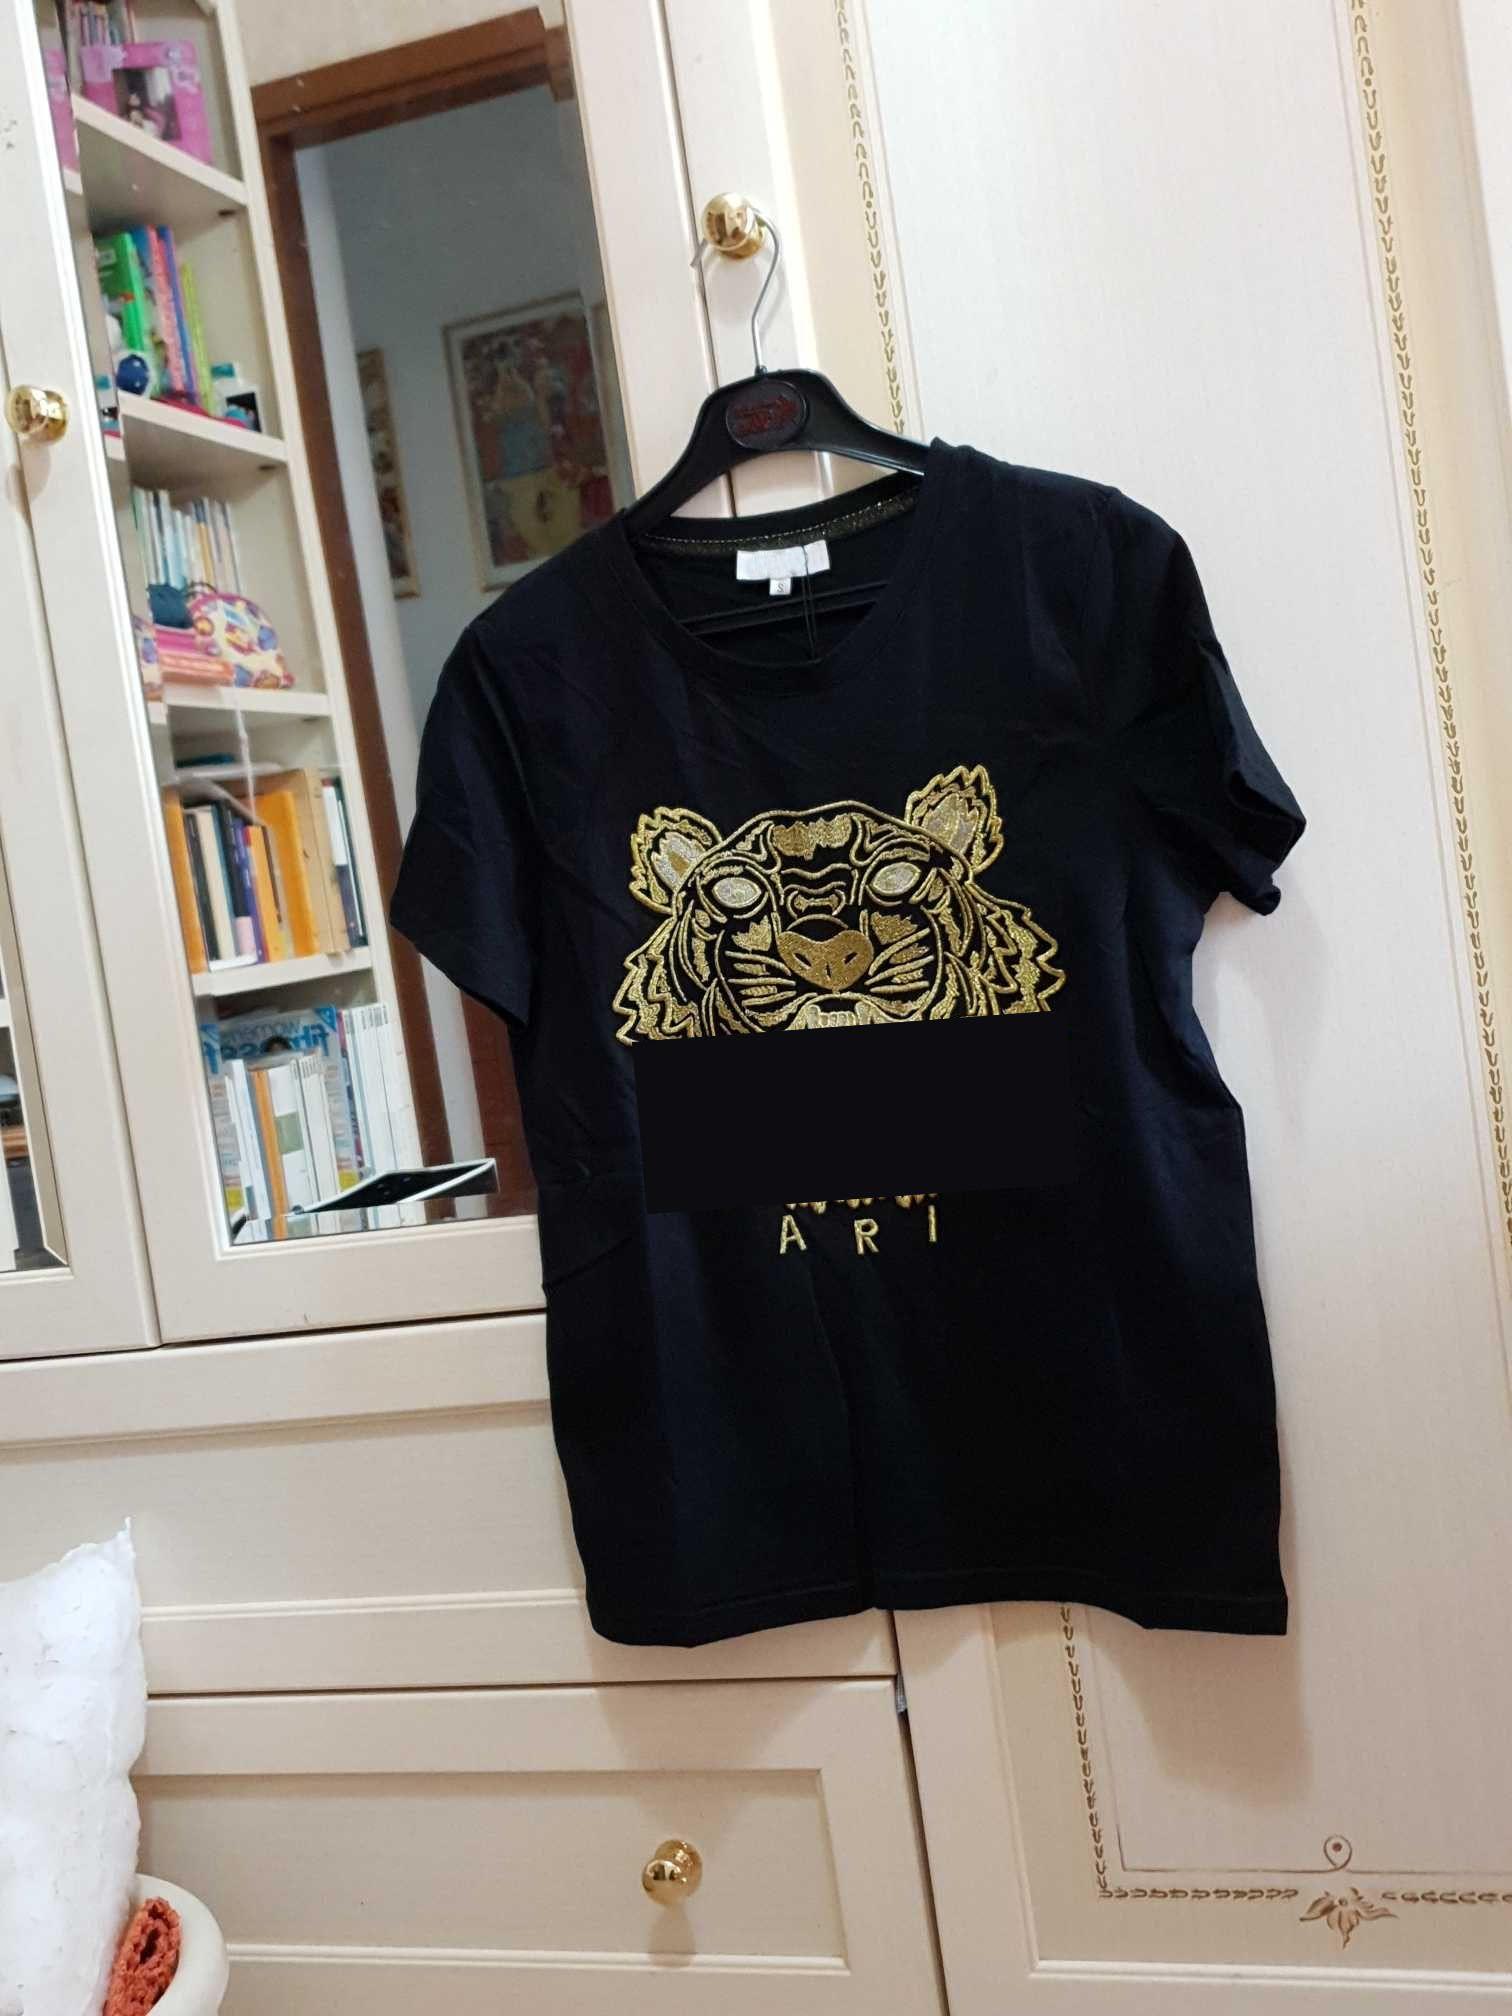 20s лето футболки для MenTiger Head письмо Вышивка T Shirt Mens Streetwear коротким рукавом Tshirt женщин Верхняя одежда S-2XL CYP720cixiu